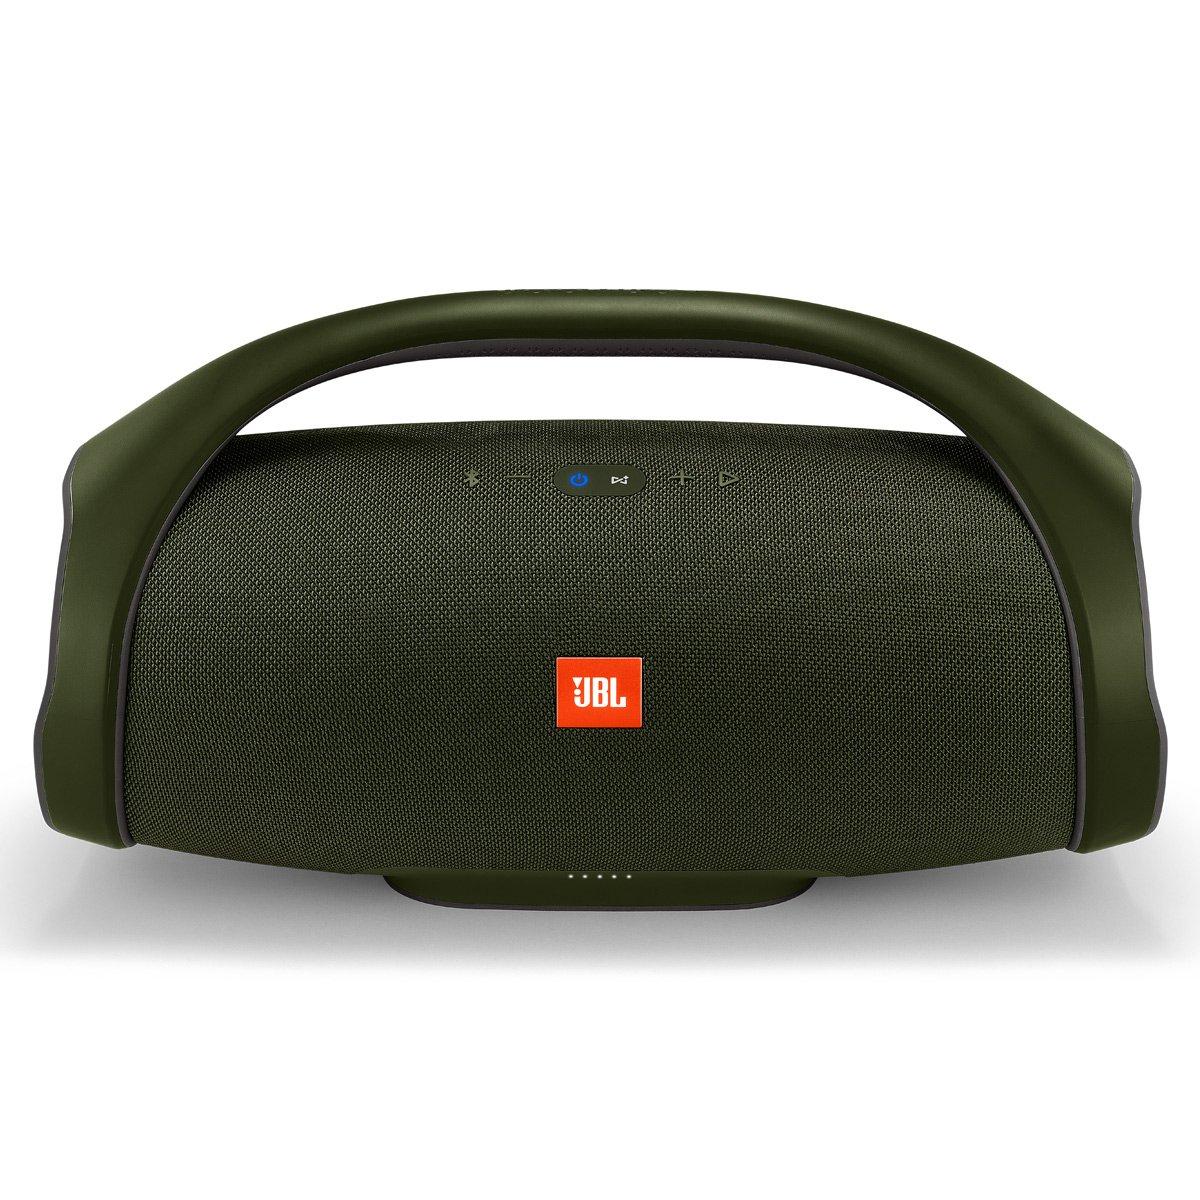 8a5e3639f783 https://wekala.com/product/amazon/B00FLL61C4/nokia-generic ...